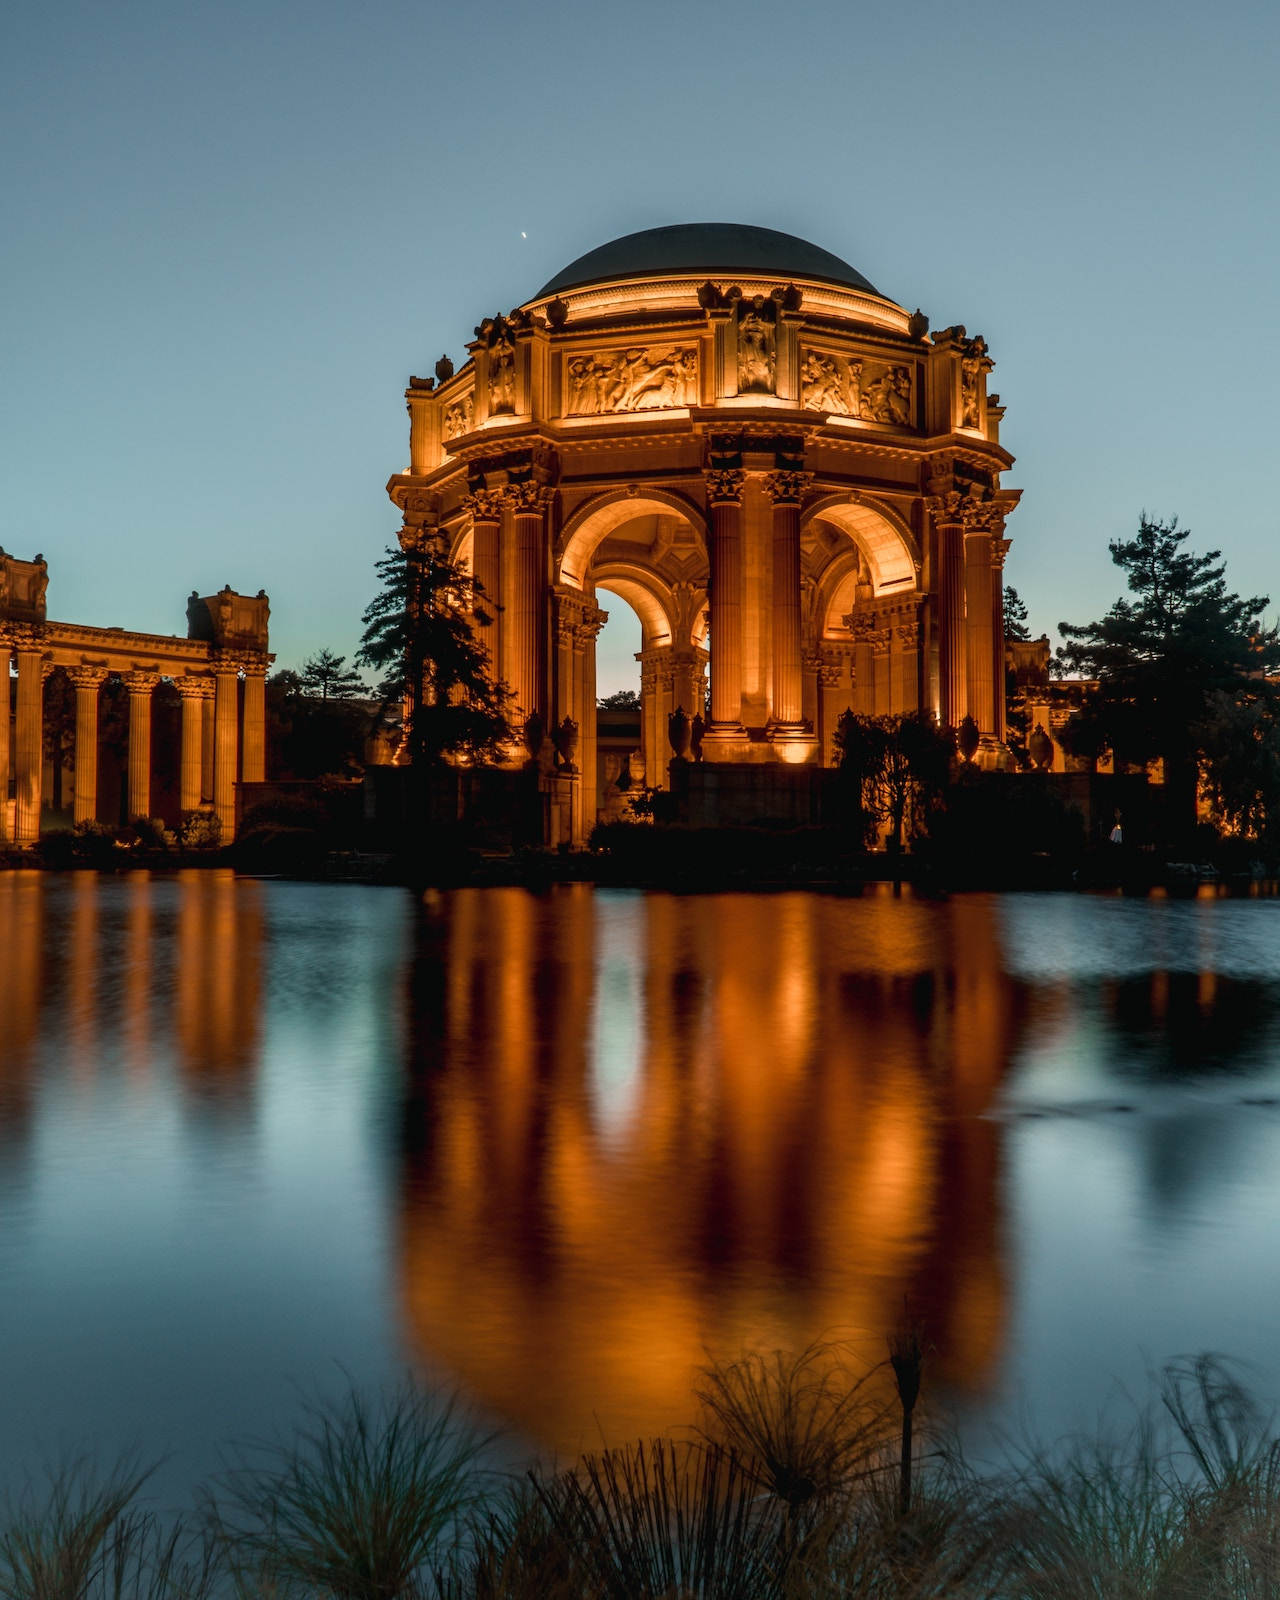 Palace Of Fine Arts |Photo: Rich Hay